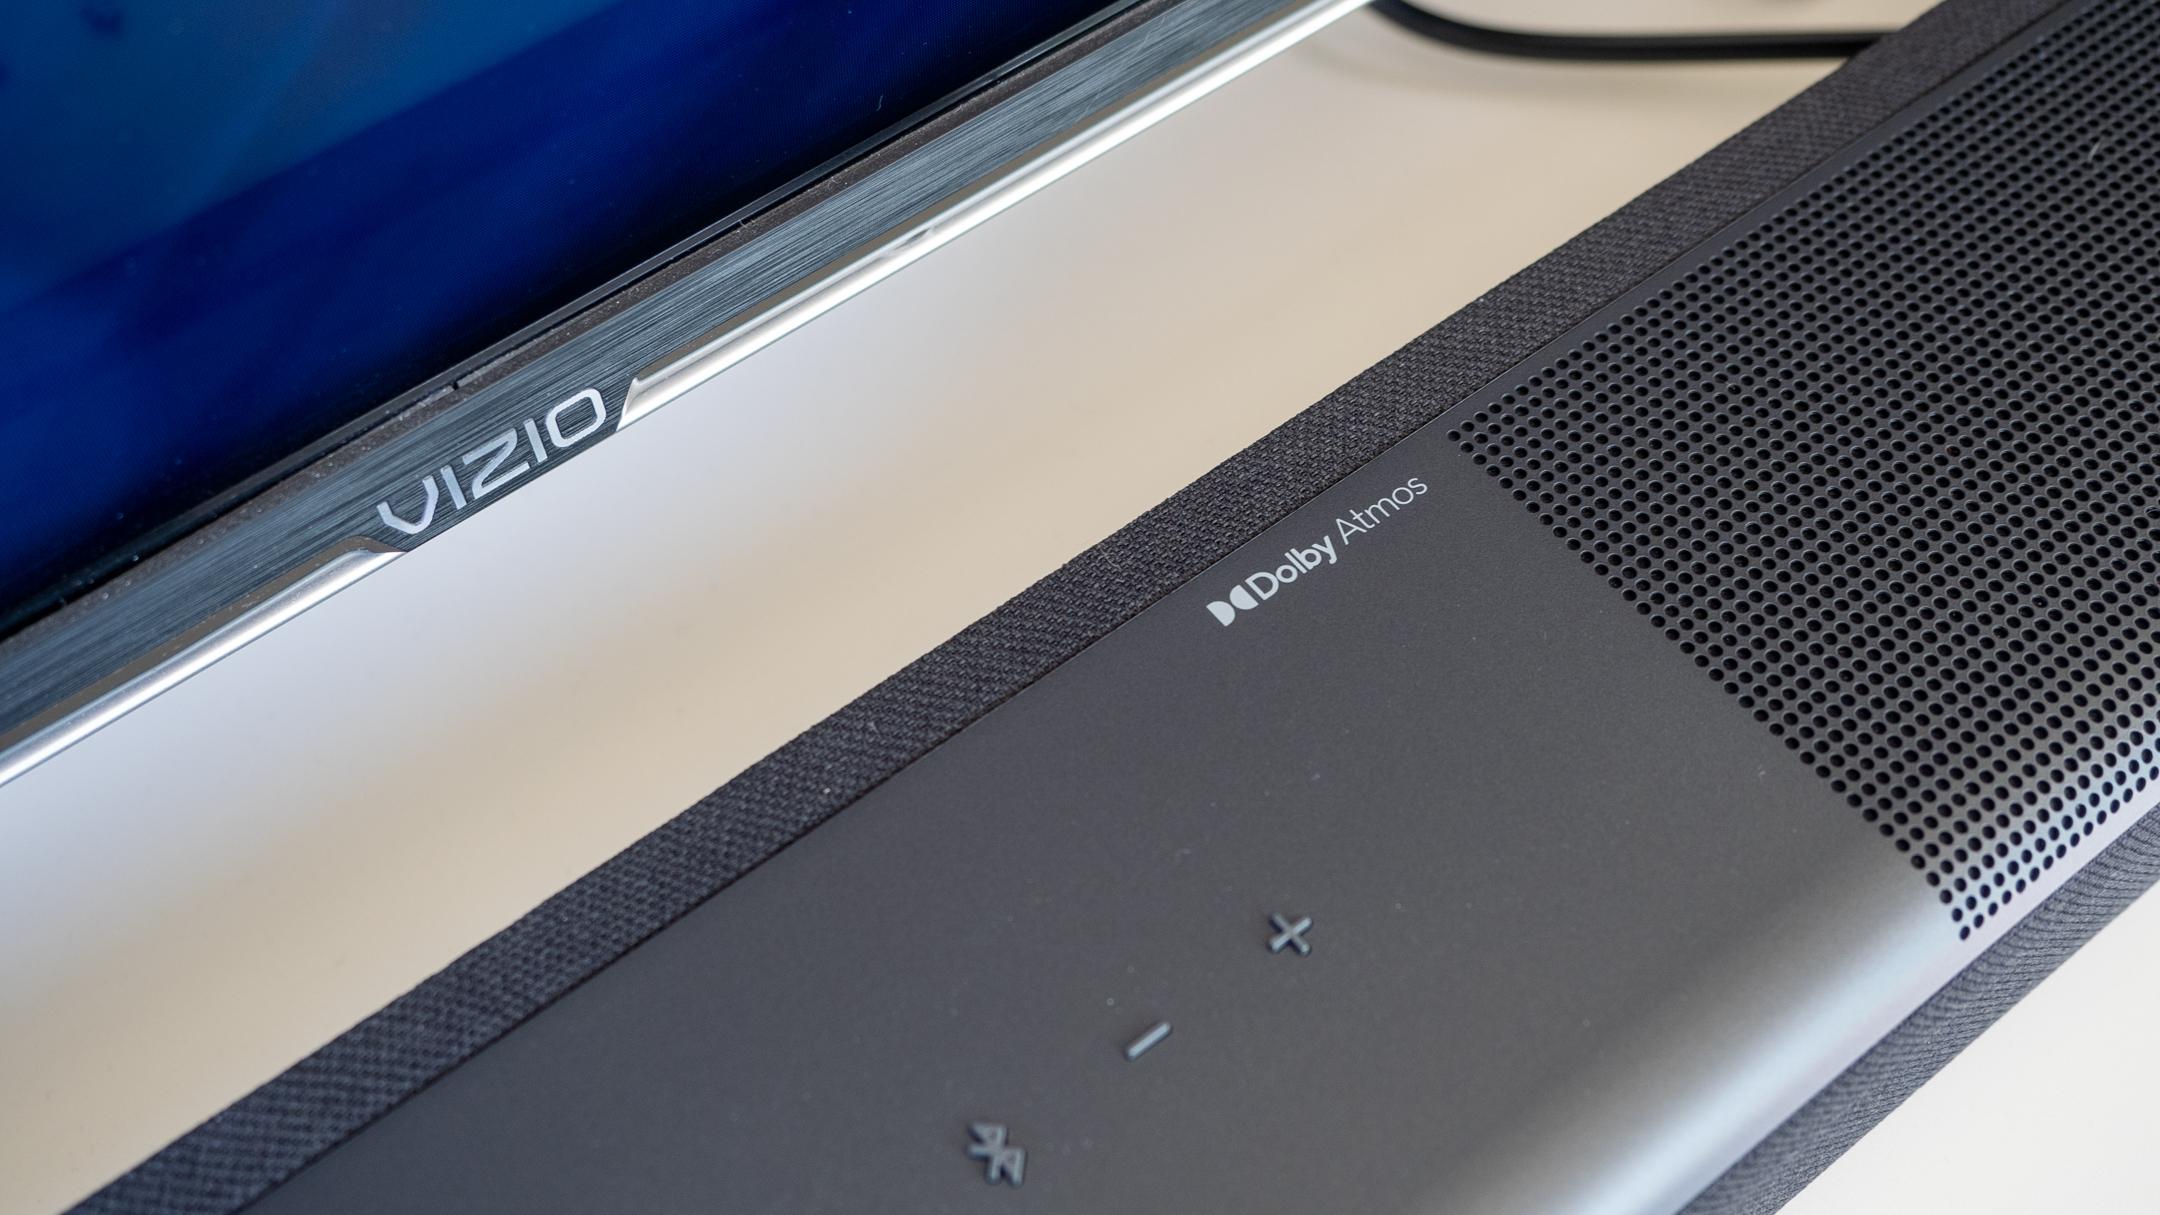 Vizio M-Series M512a-H6 Sound Bar